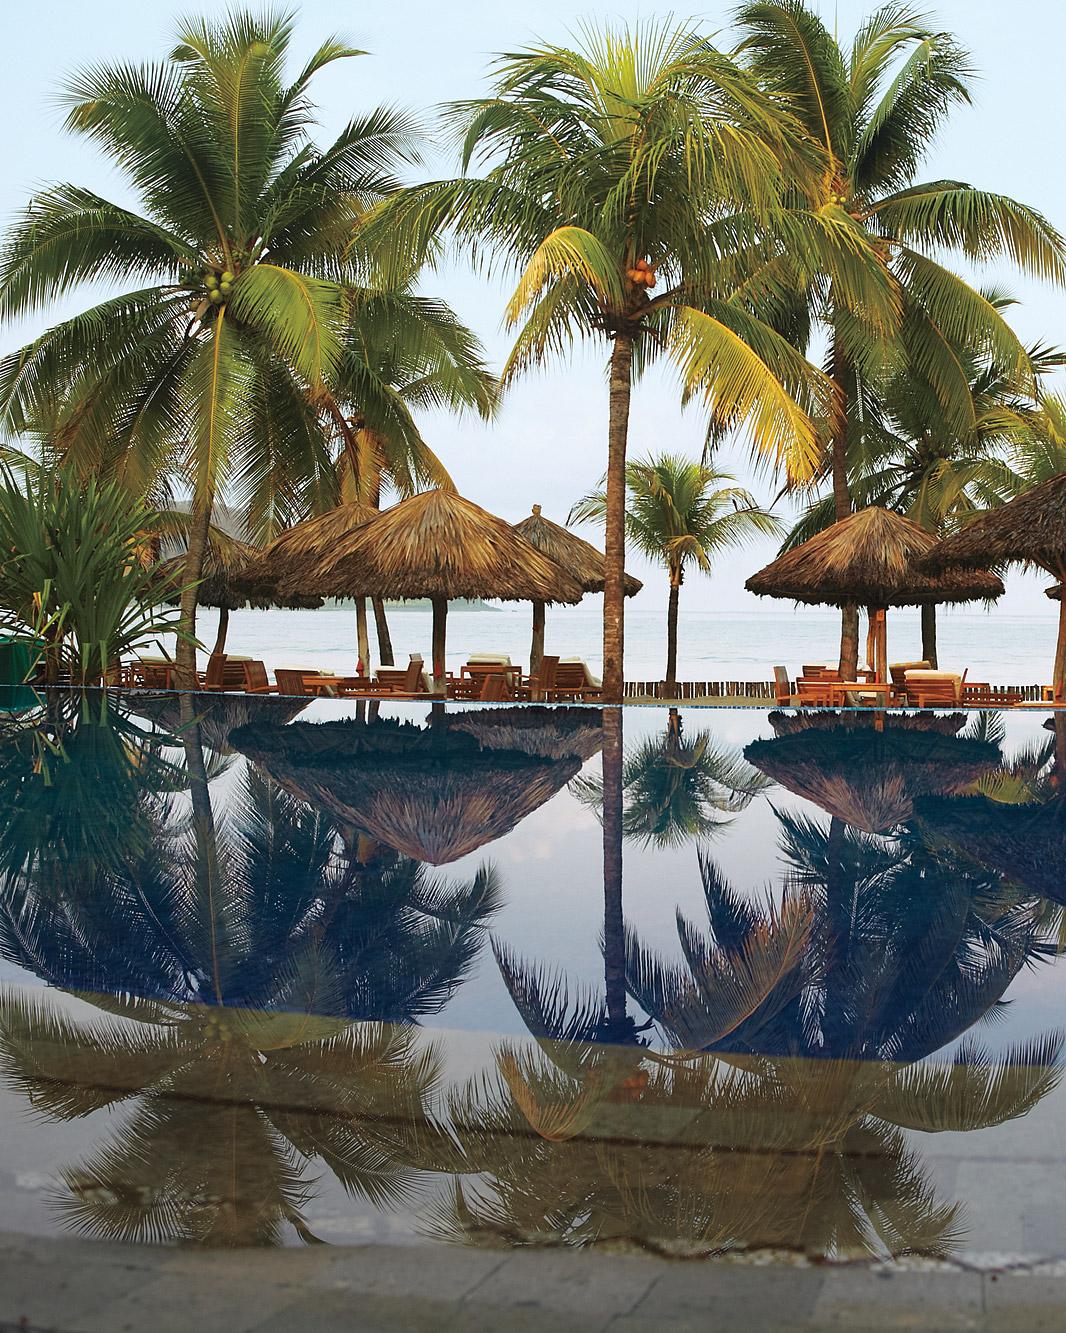 rw-mexico-palm-trees-mwds107779.jpg